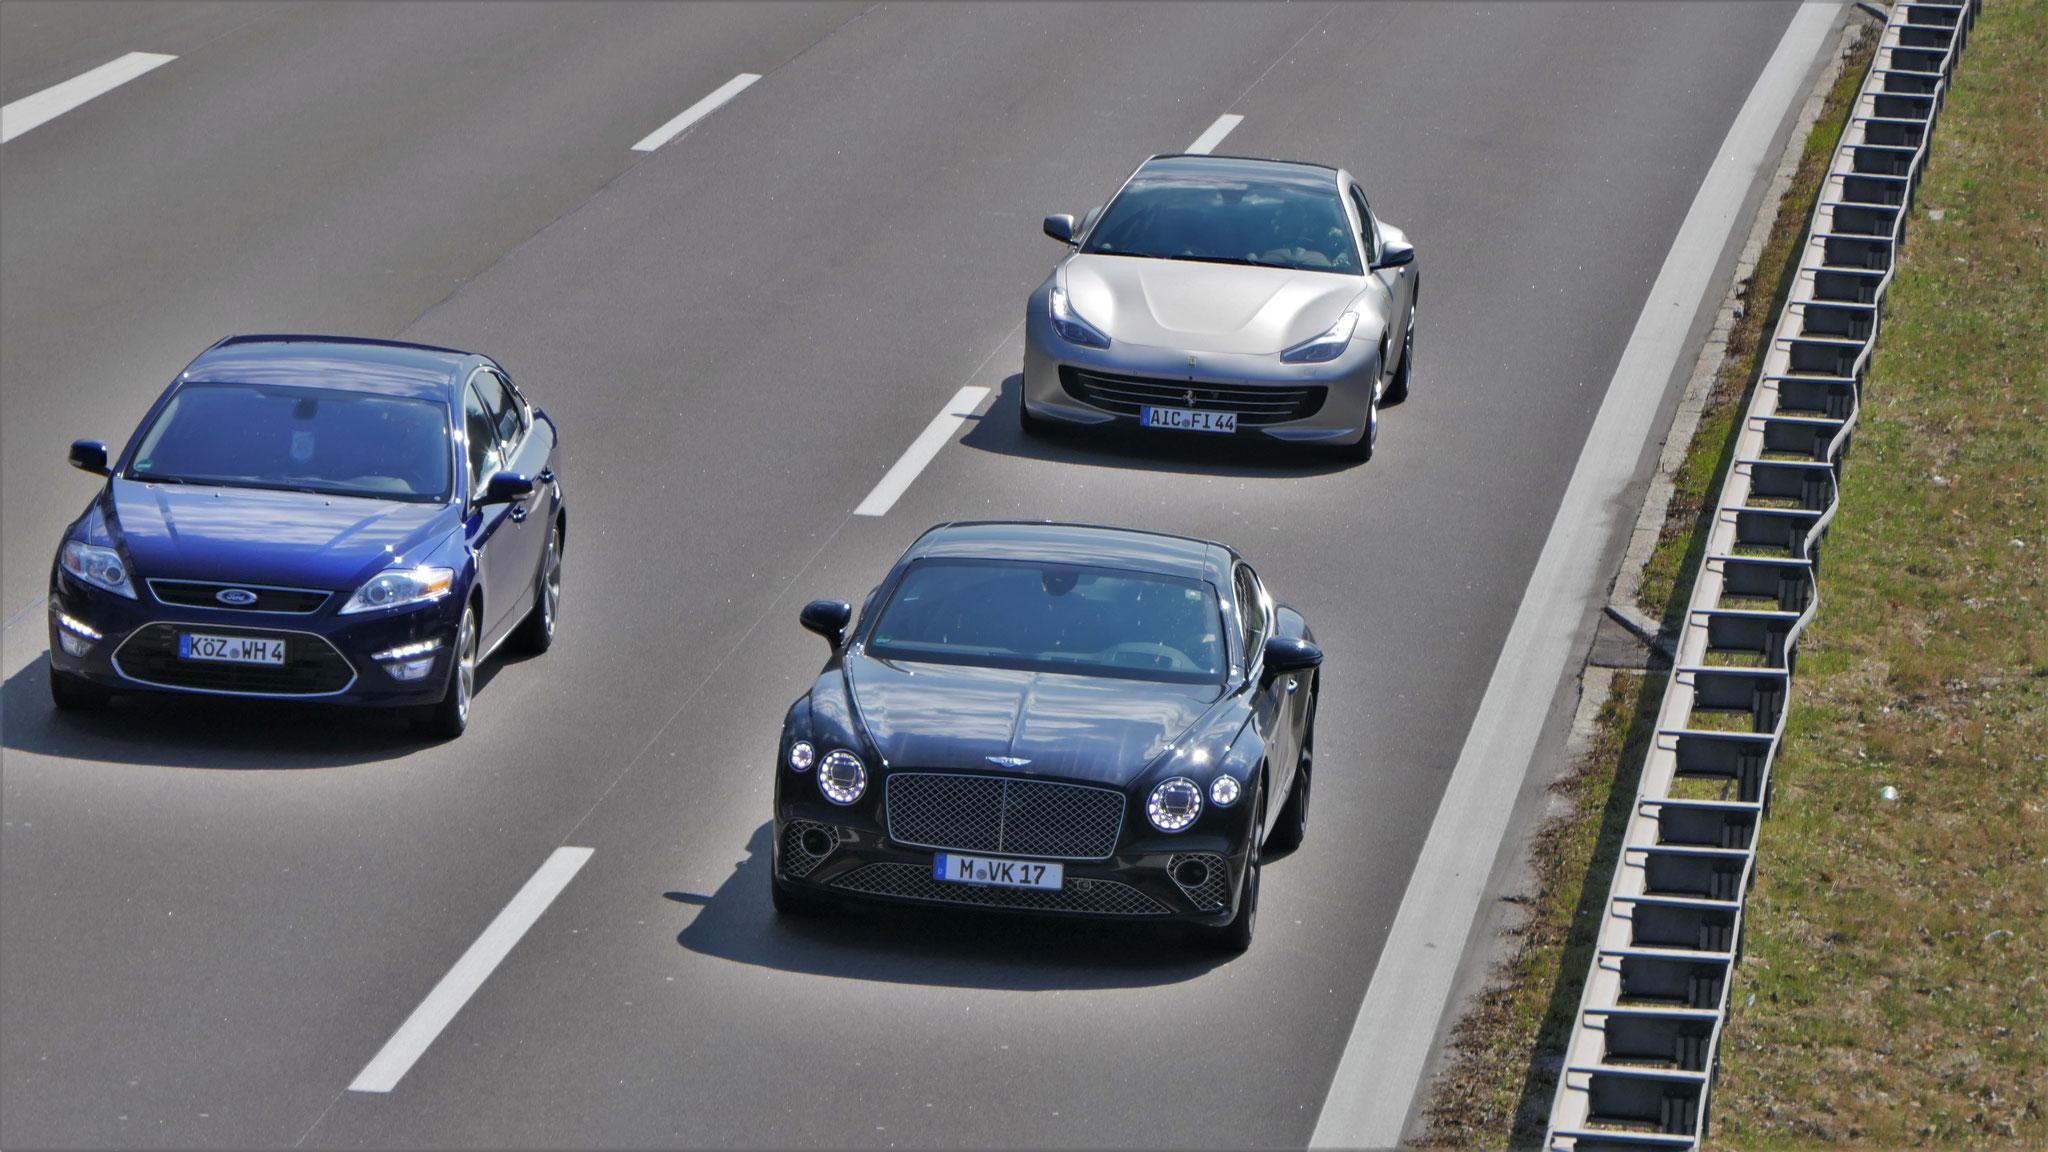 Bentley Continental GT - M-VK-17